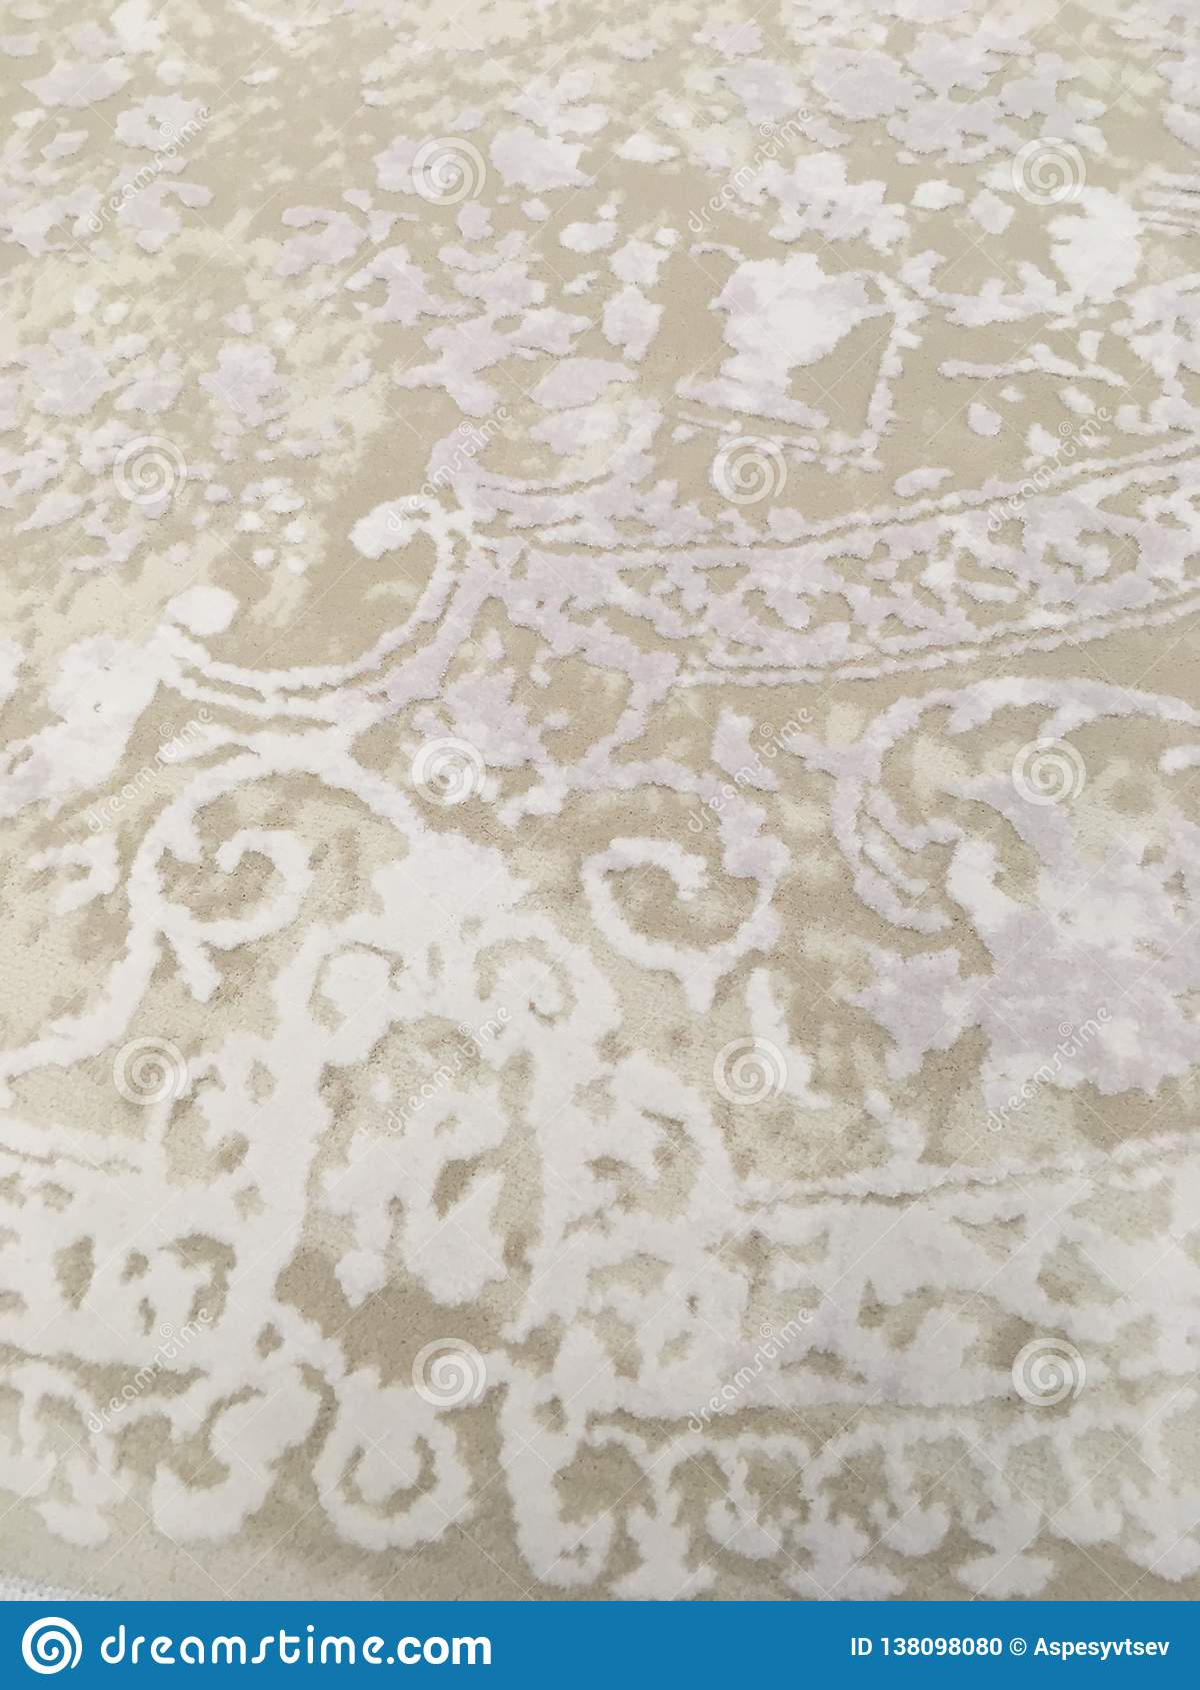 Old worn out elegant damask pattern carpet / floor covering. Luxury grunge vertical background